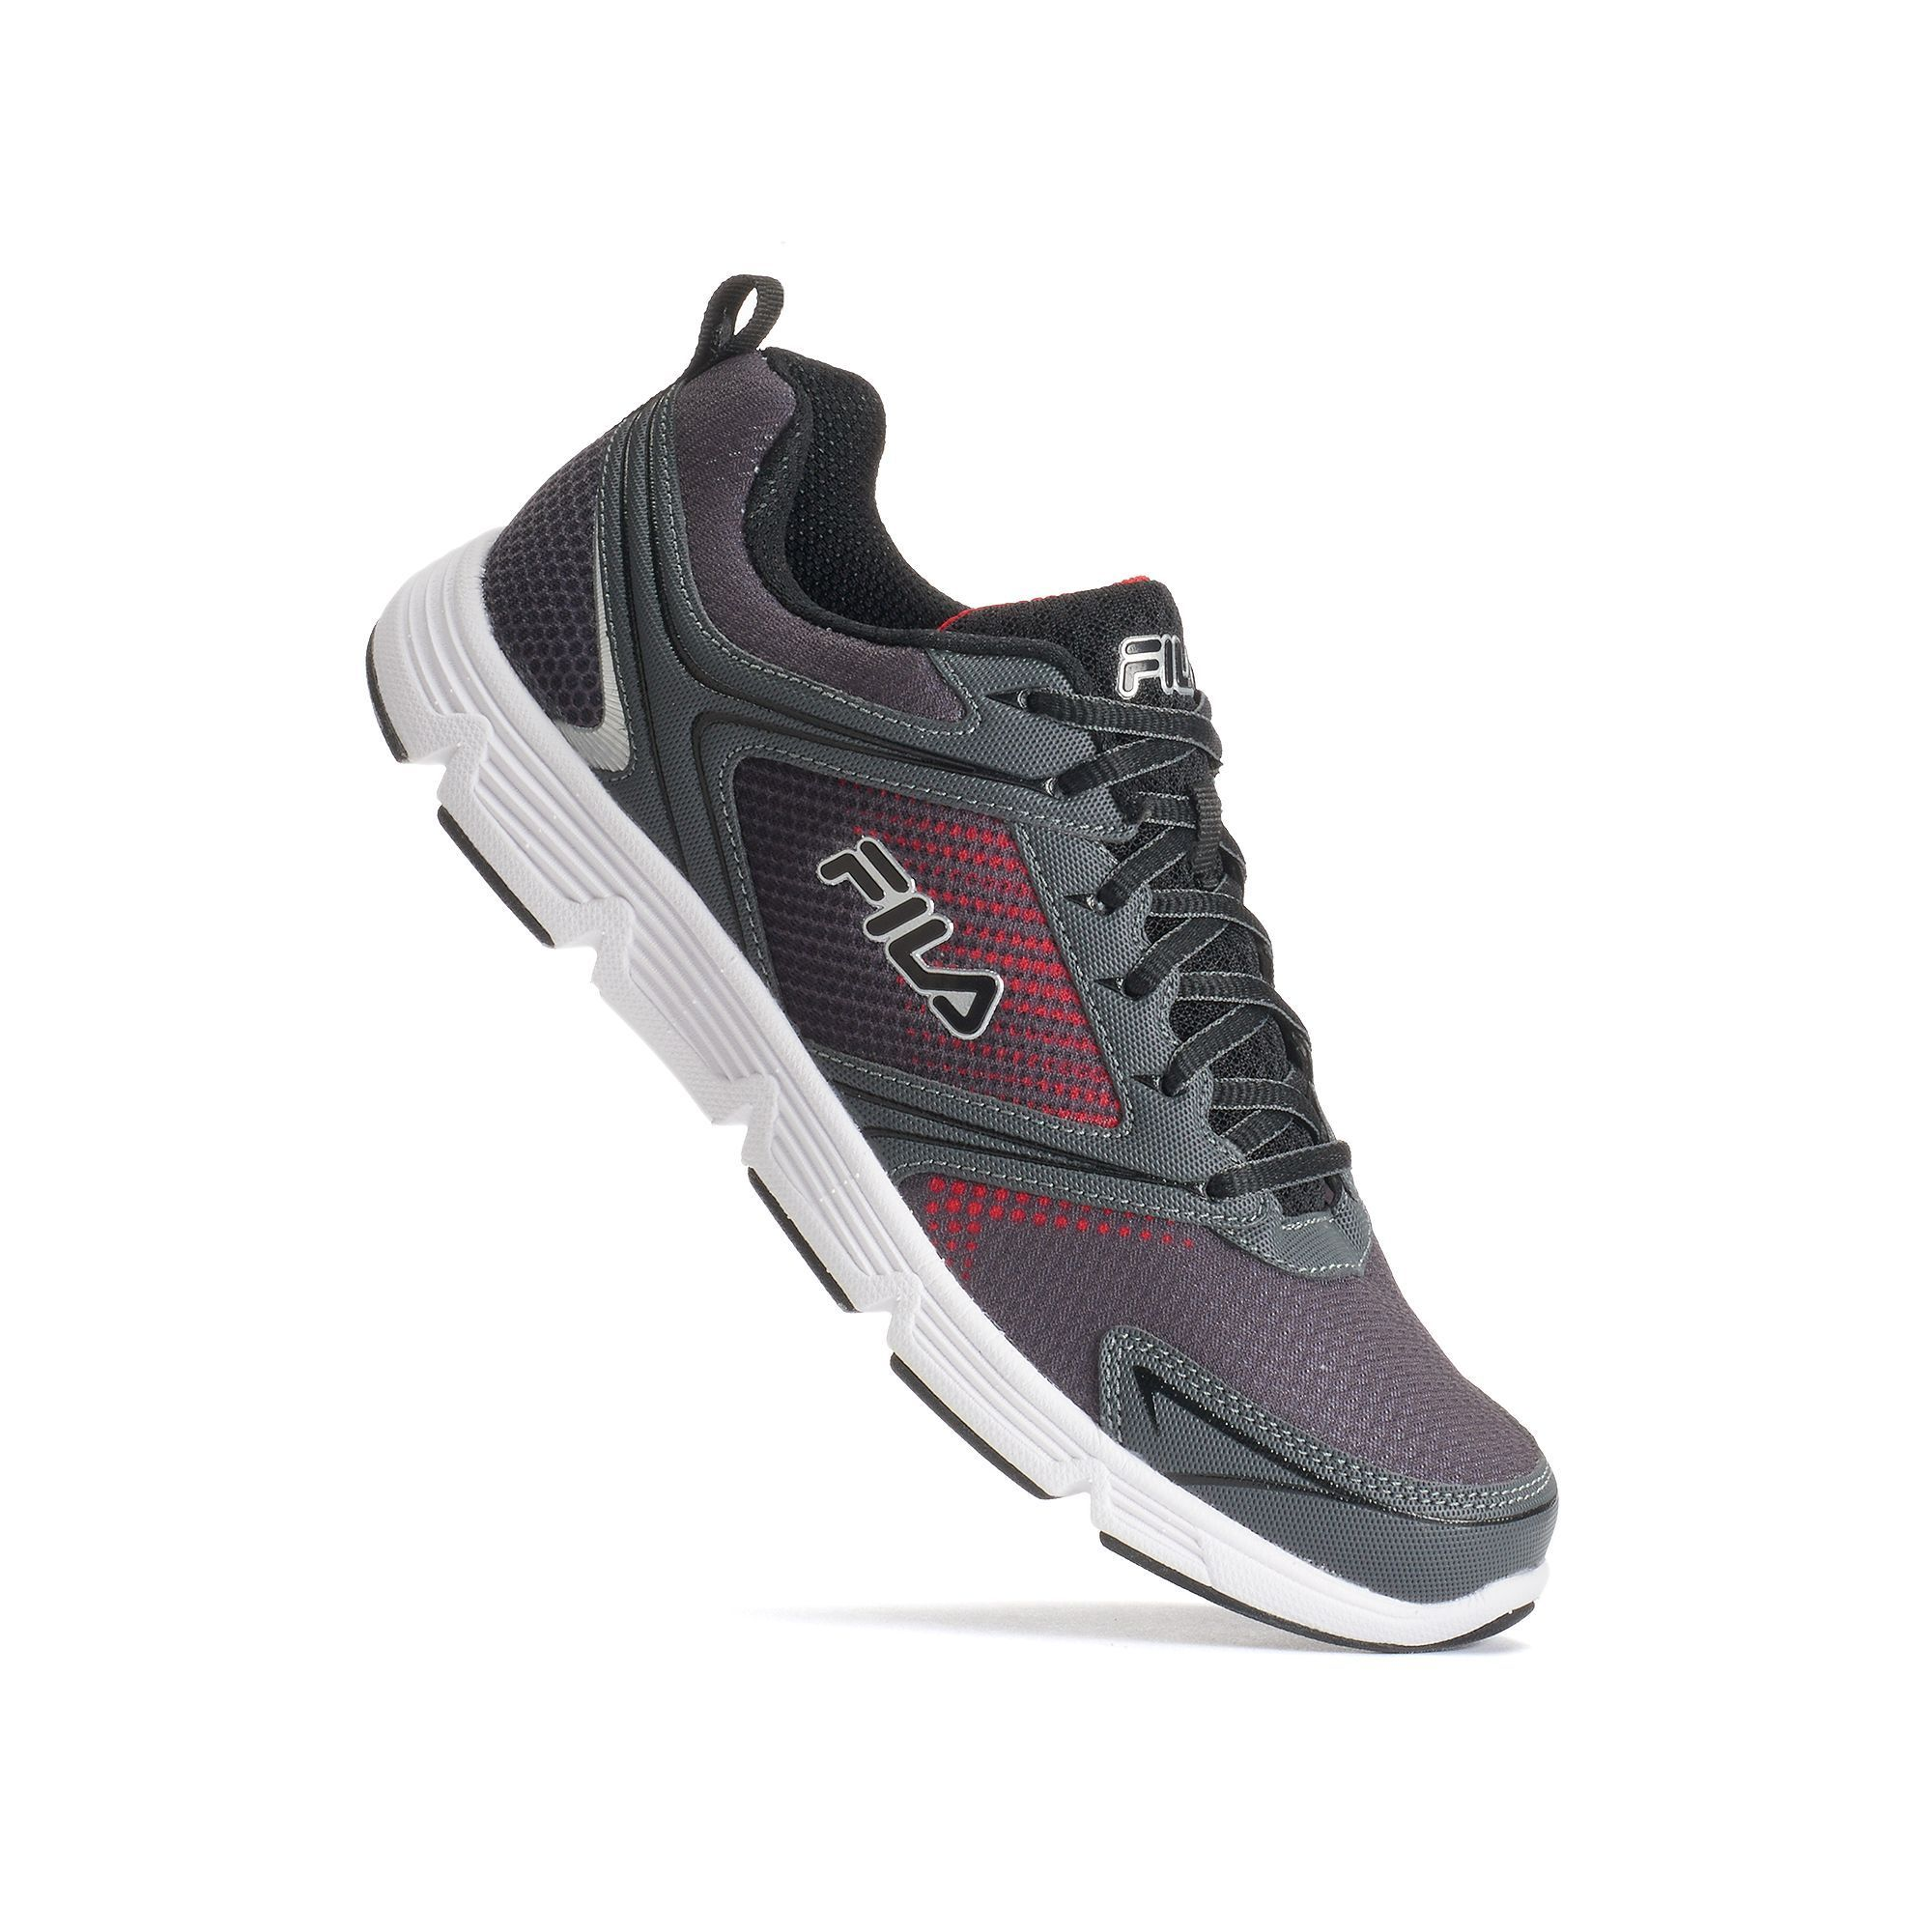 7176b8aa4b98 Fila Vector Men s Running Shoes